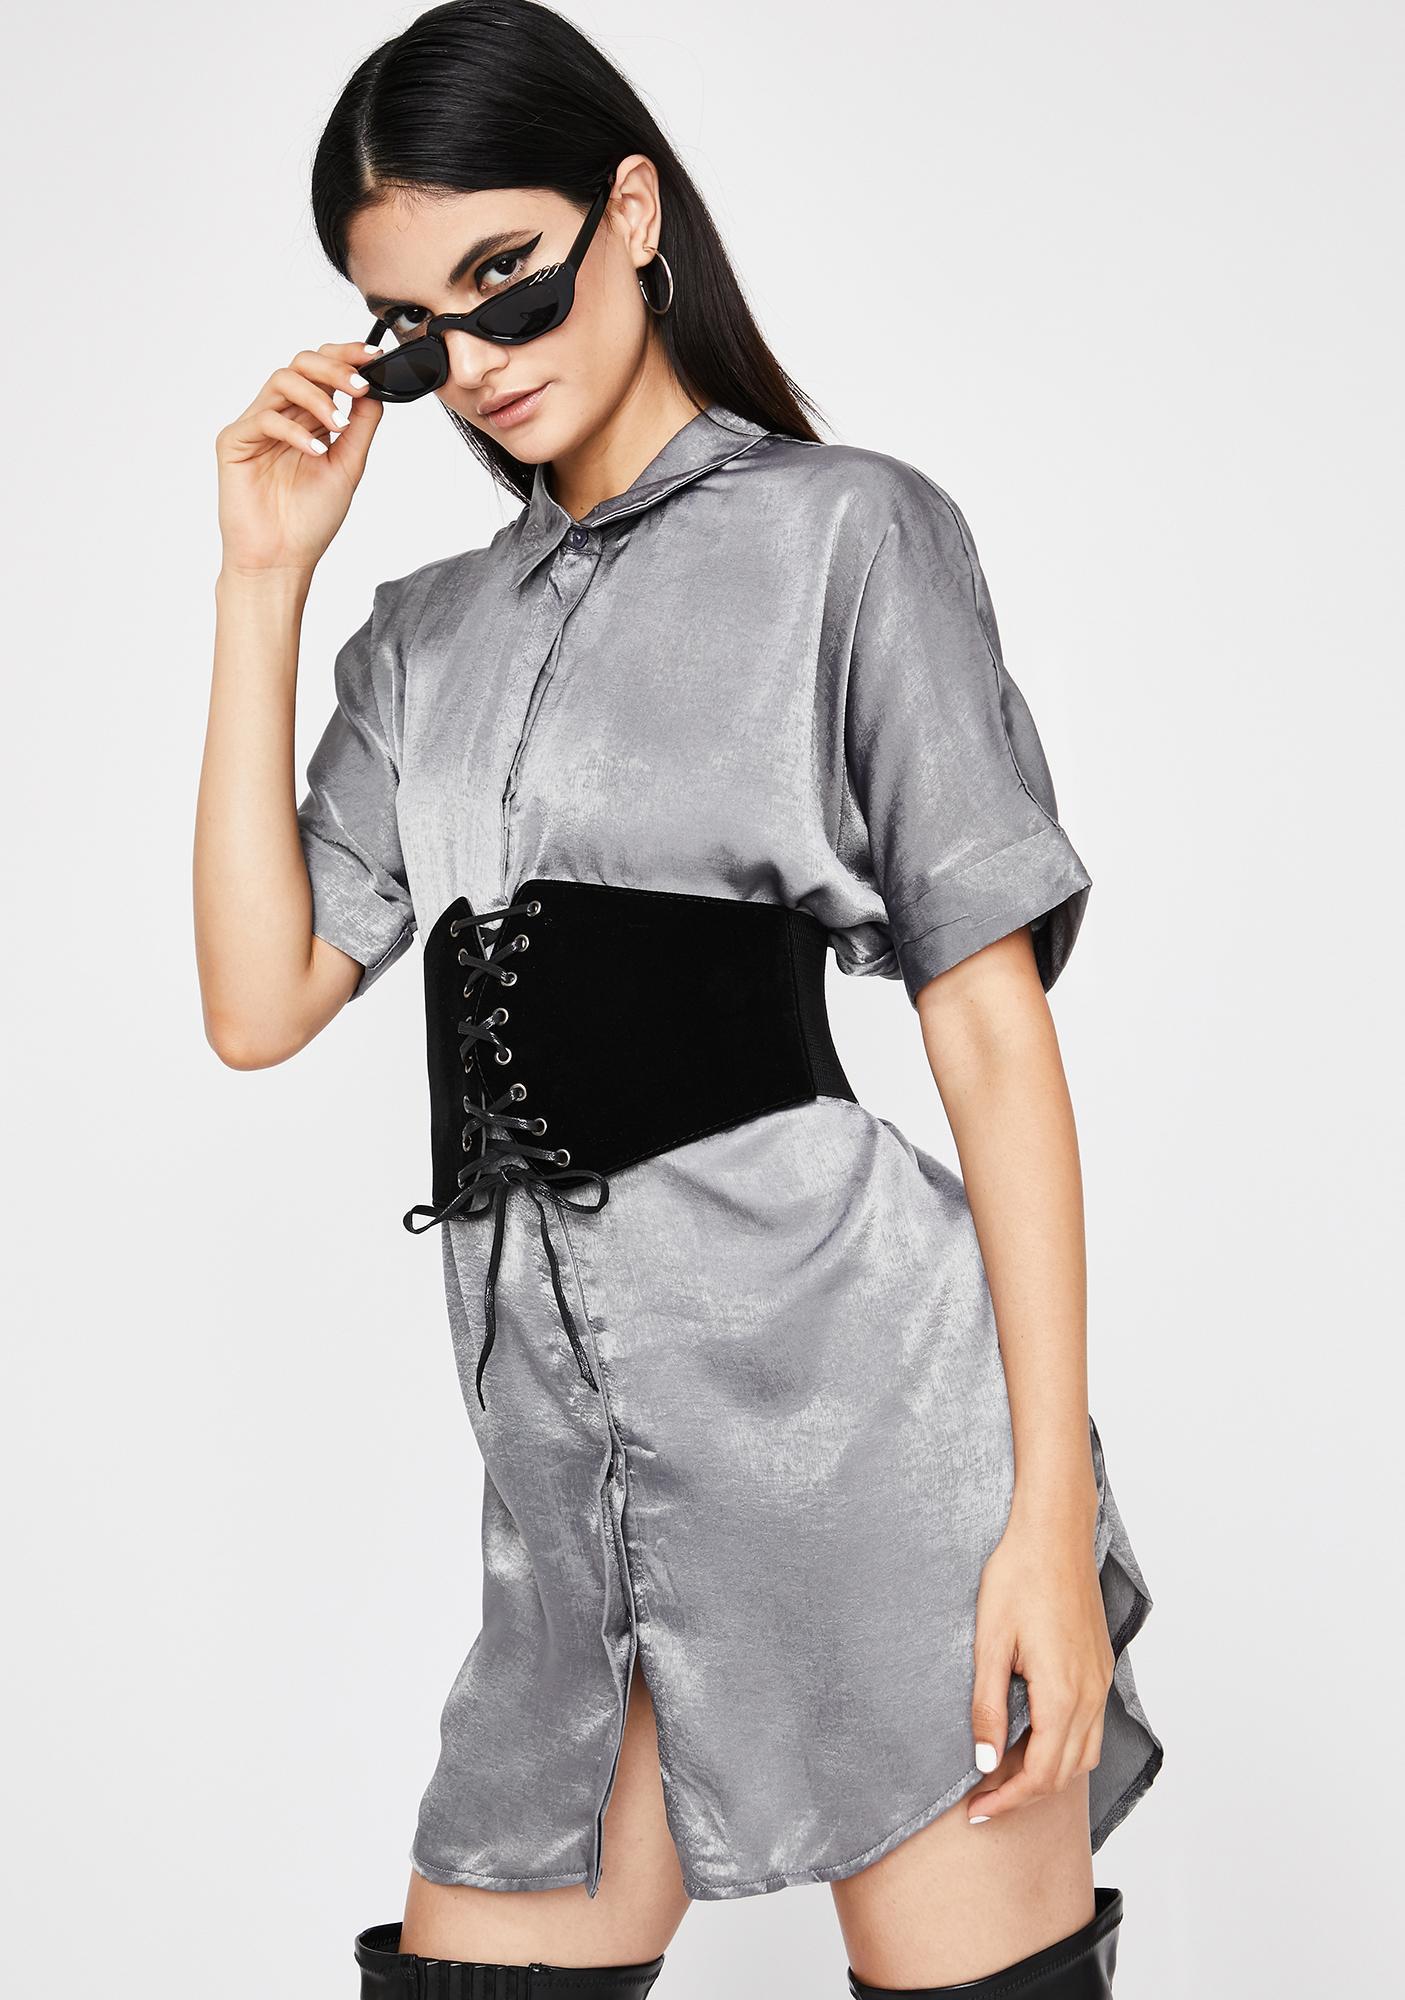 233e162eb66 Moonlit Mistress Corset Dress